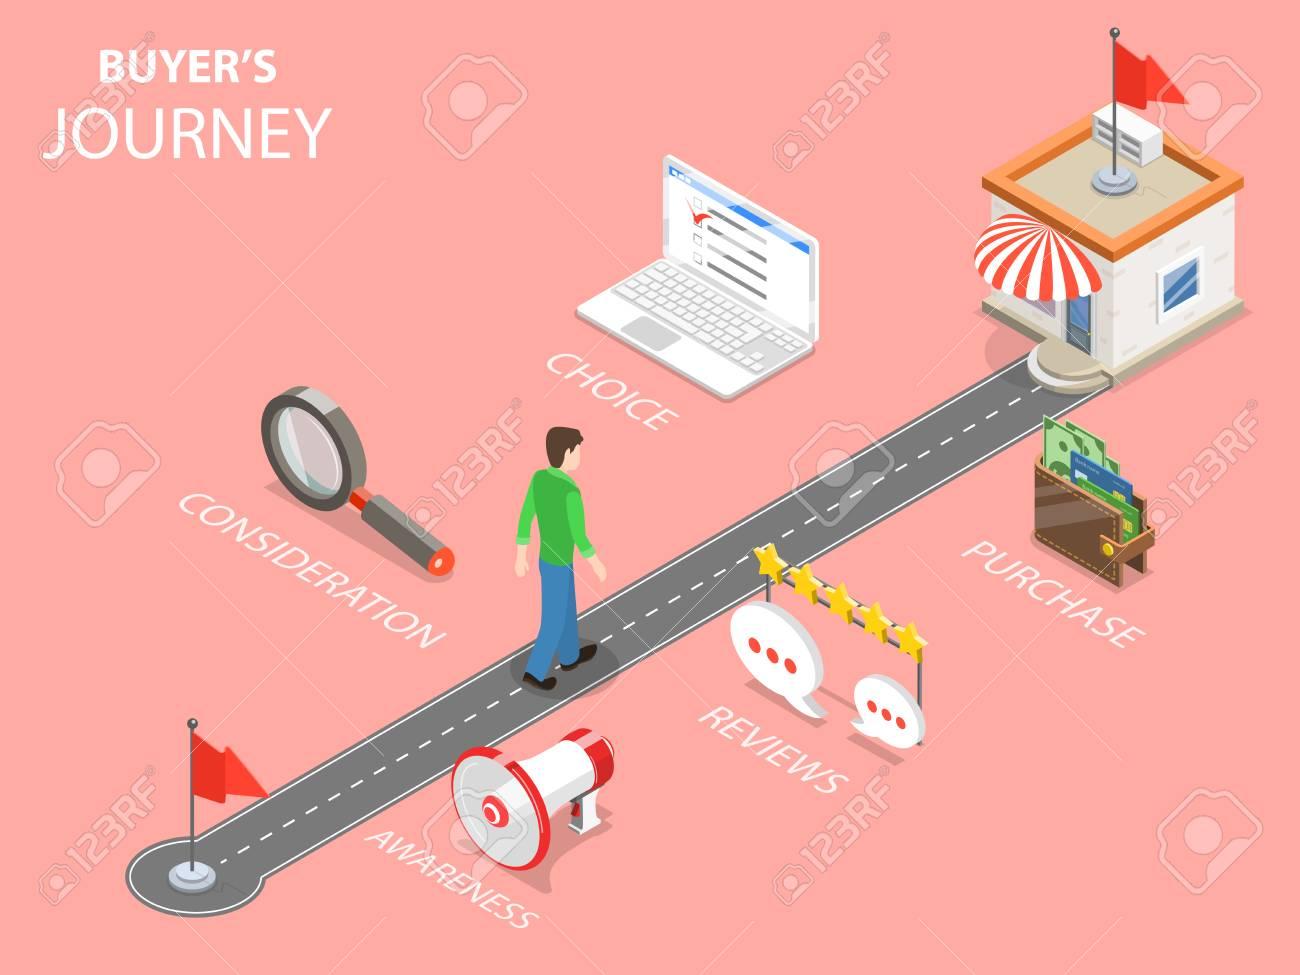 Buyer journey flat isometric vector illustration. - 100975439